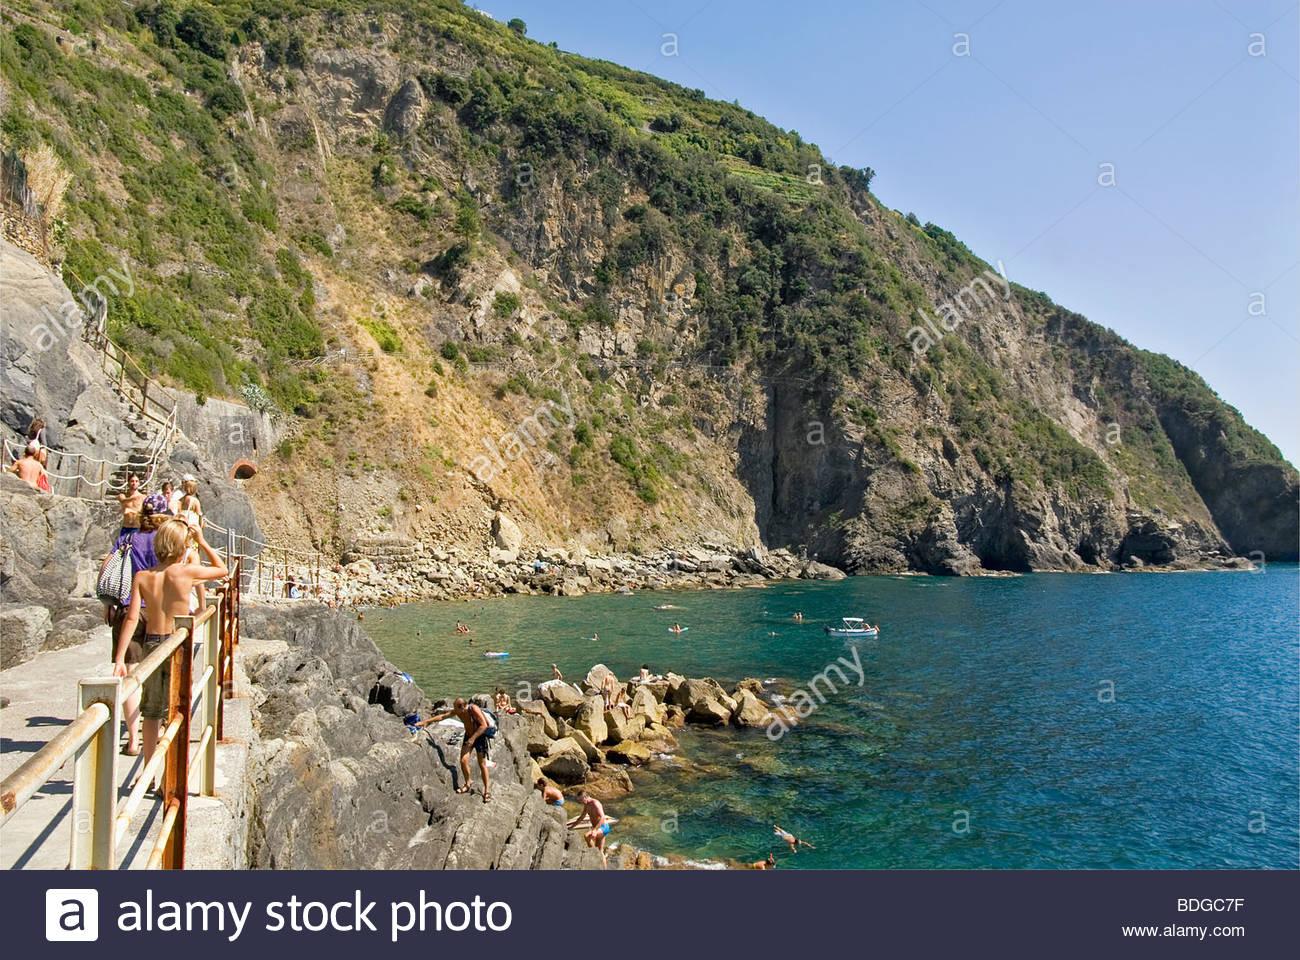 Village at the Parco Naturale Cinque Terre near Riomaggiore at the Ligurian Coast, North West Italy. - Stock Image